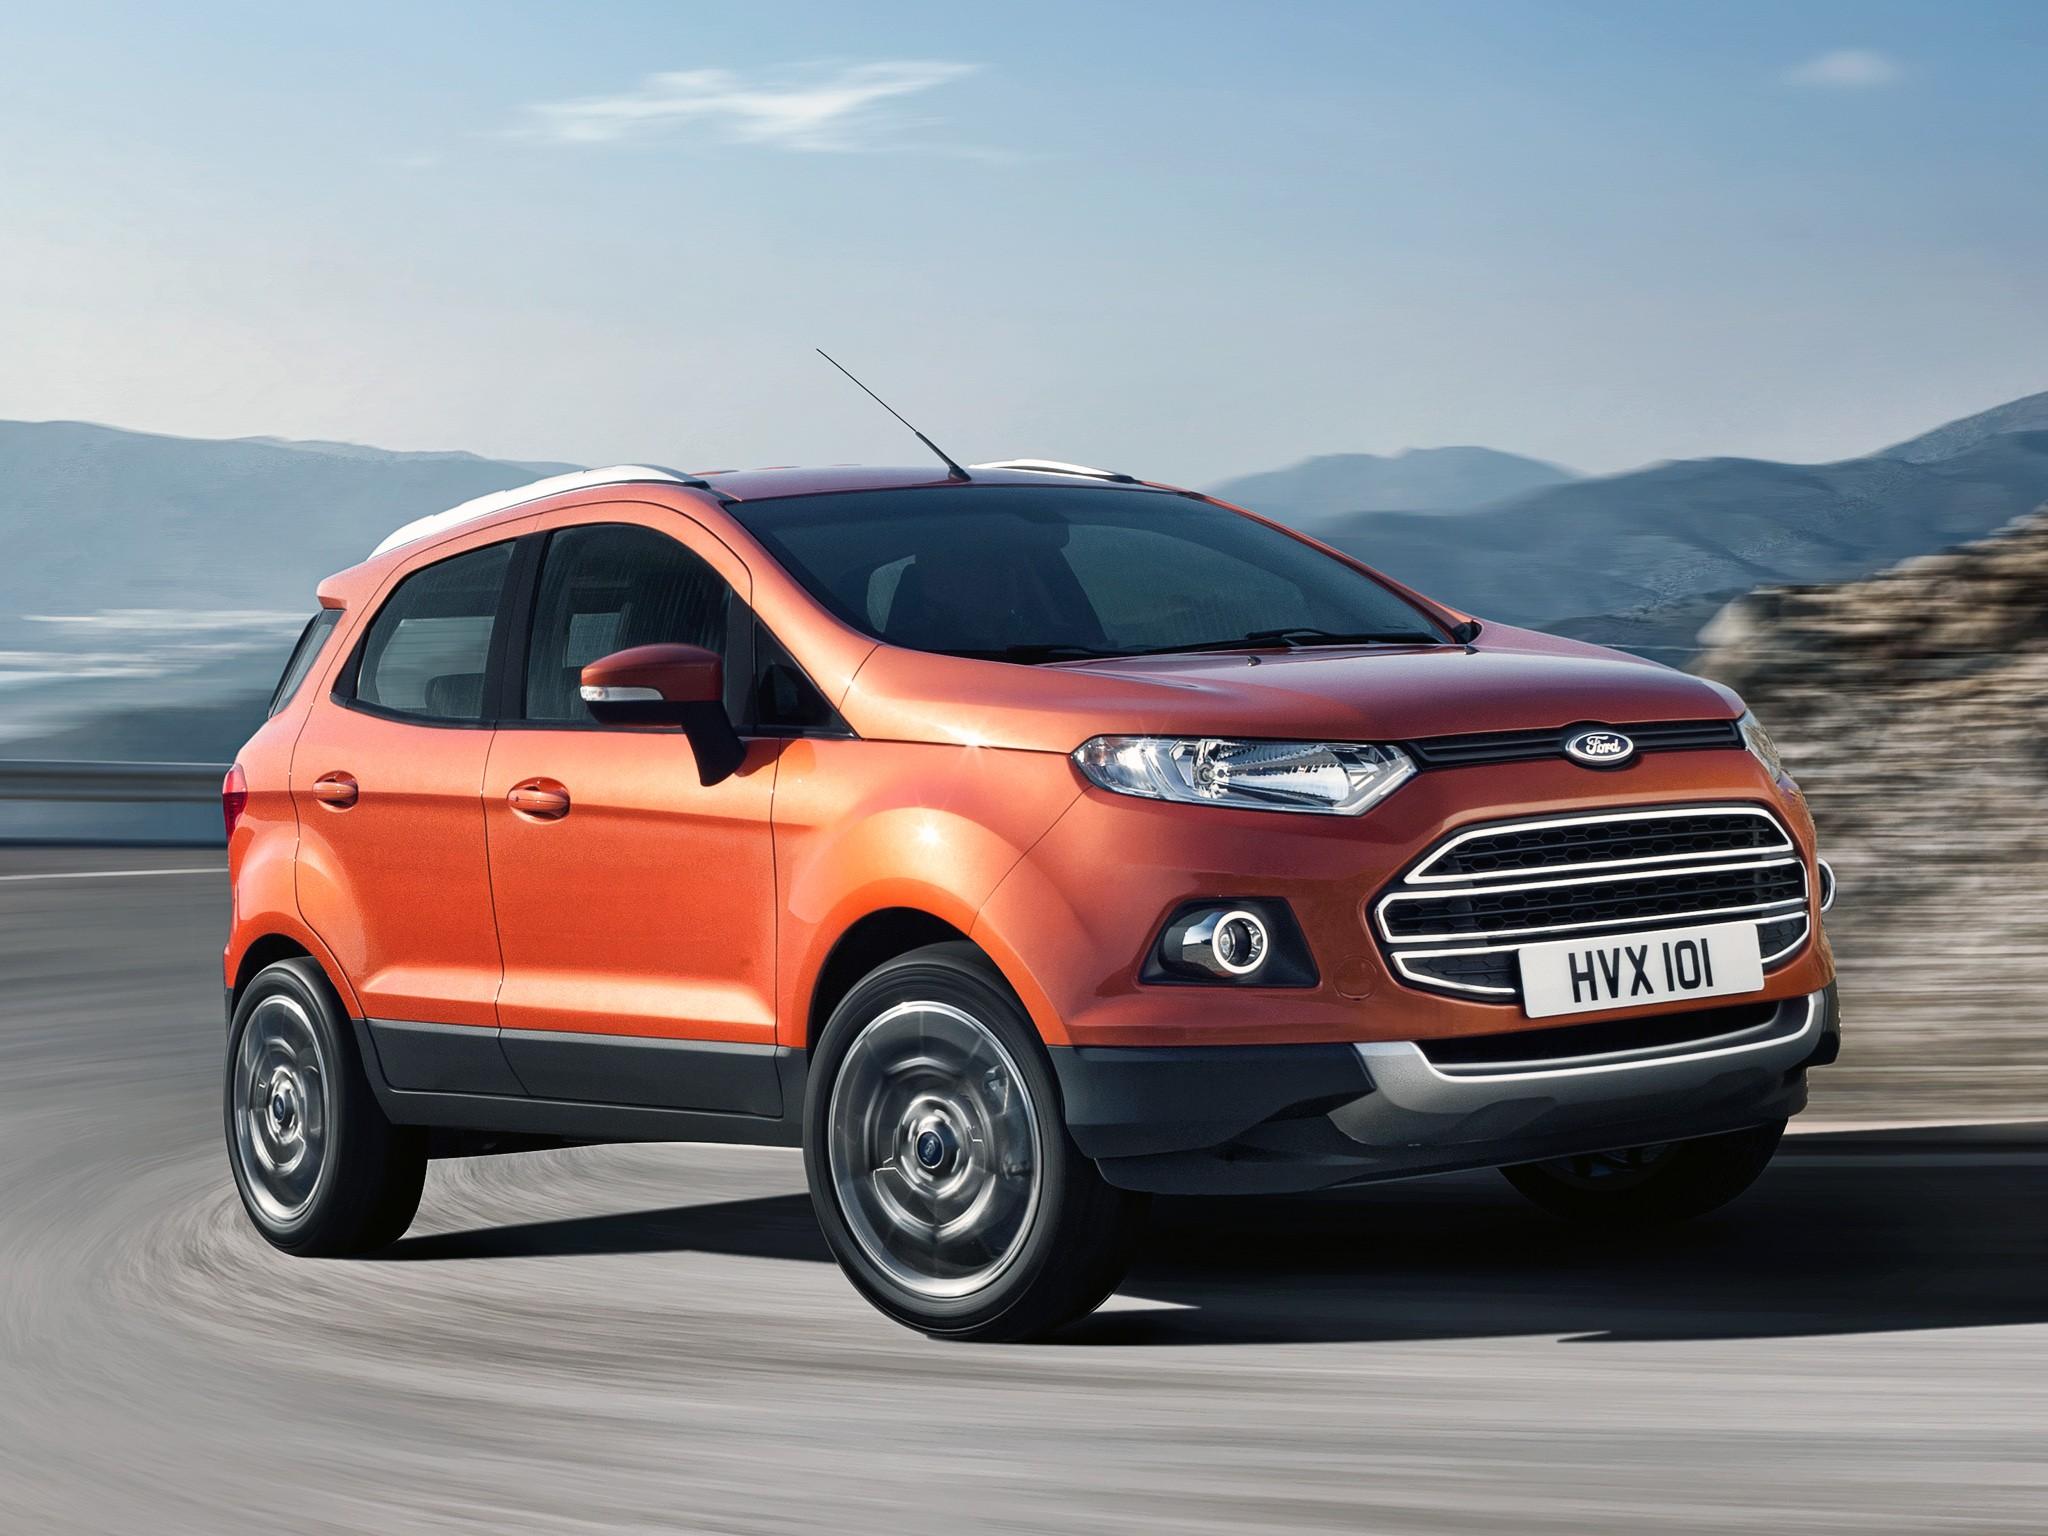 Image Result For Ford Ecosport Uae